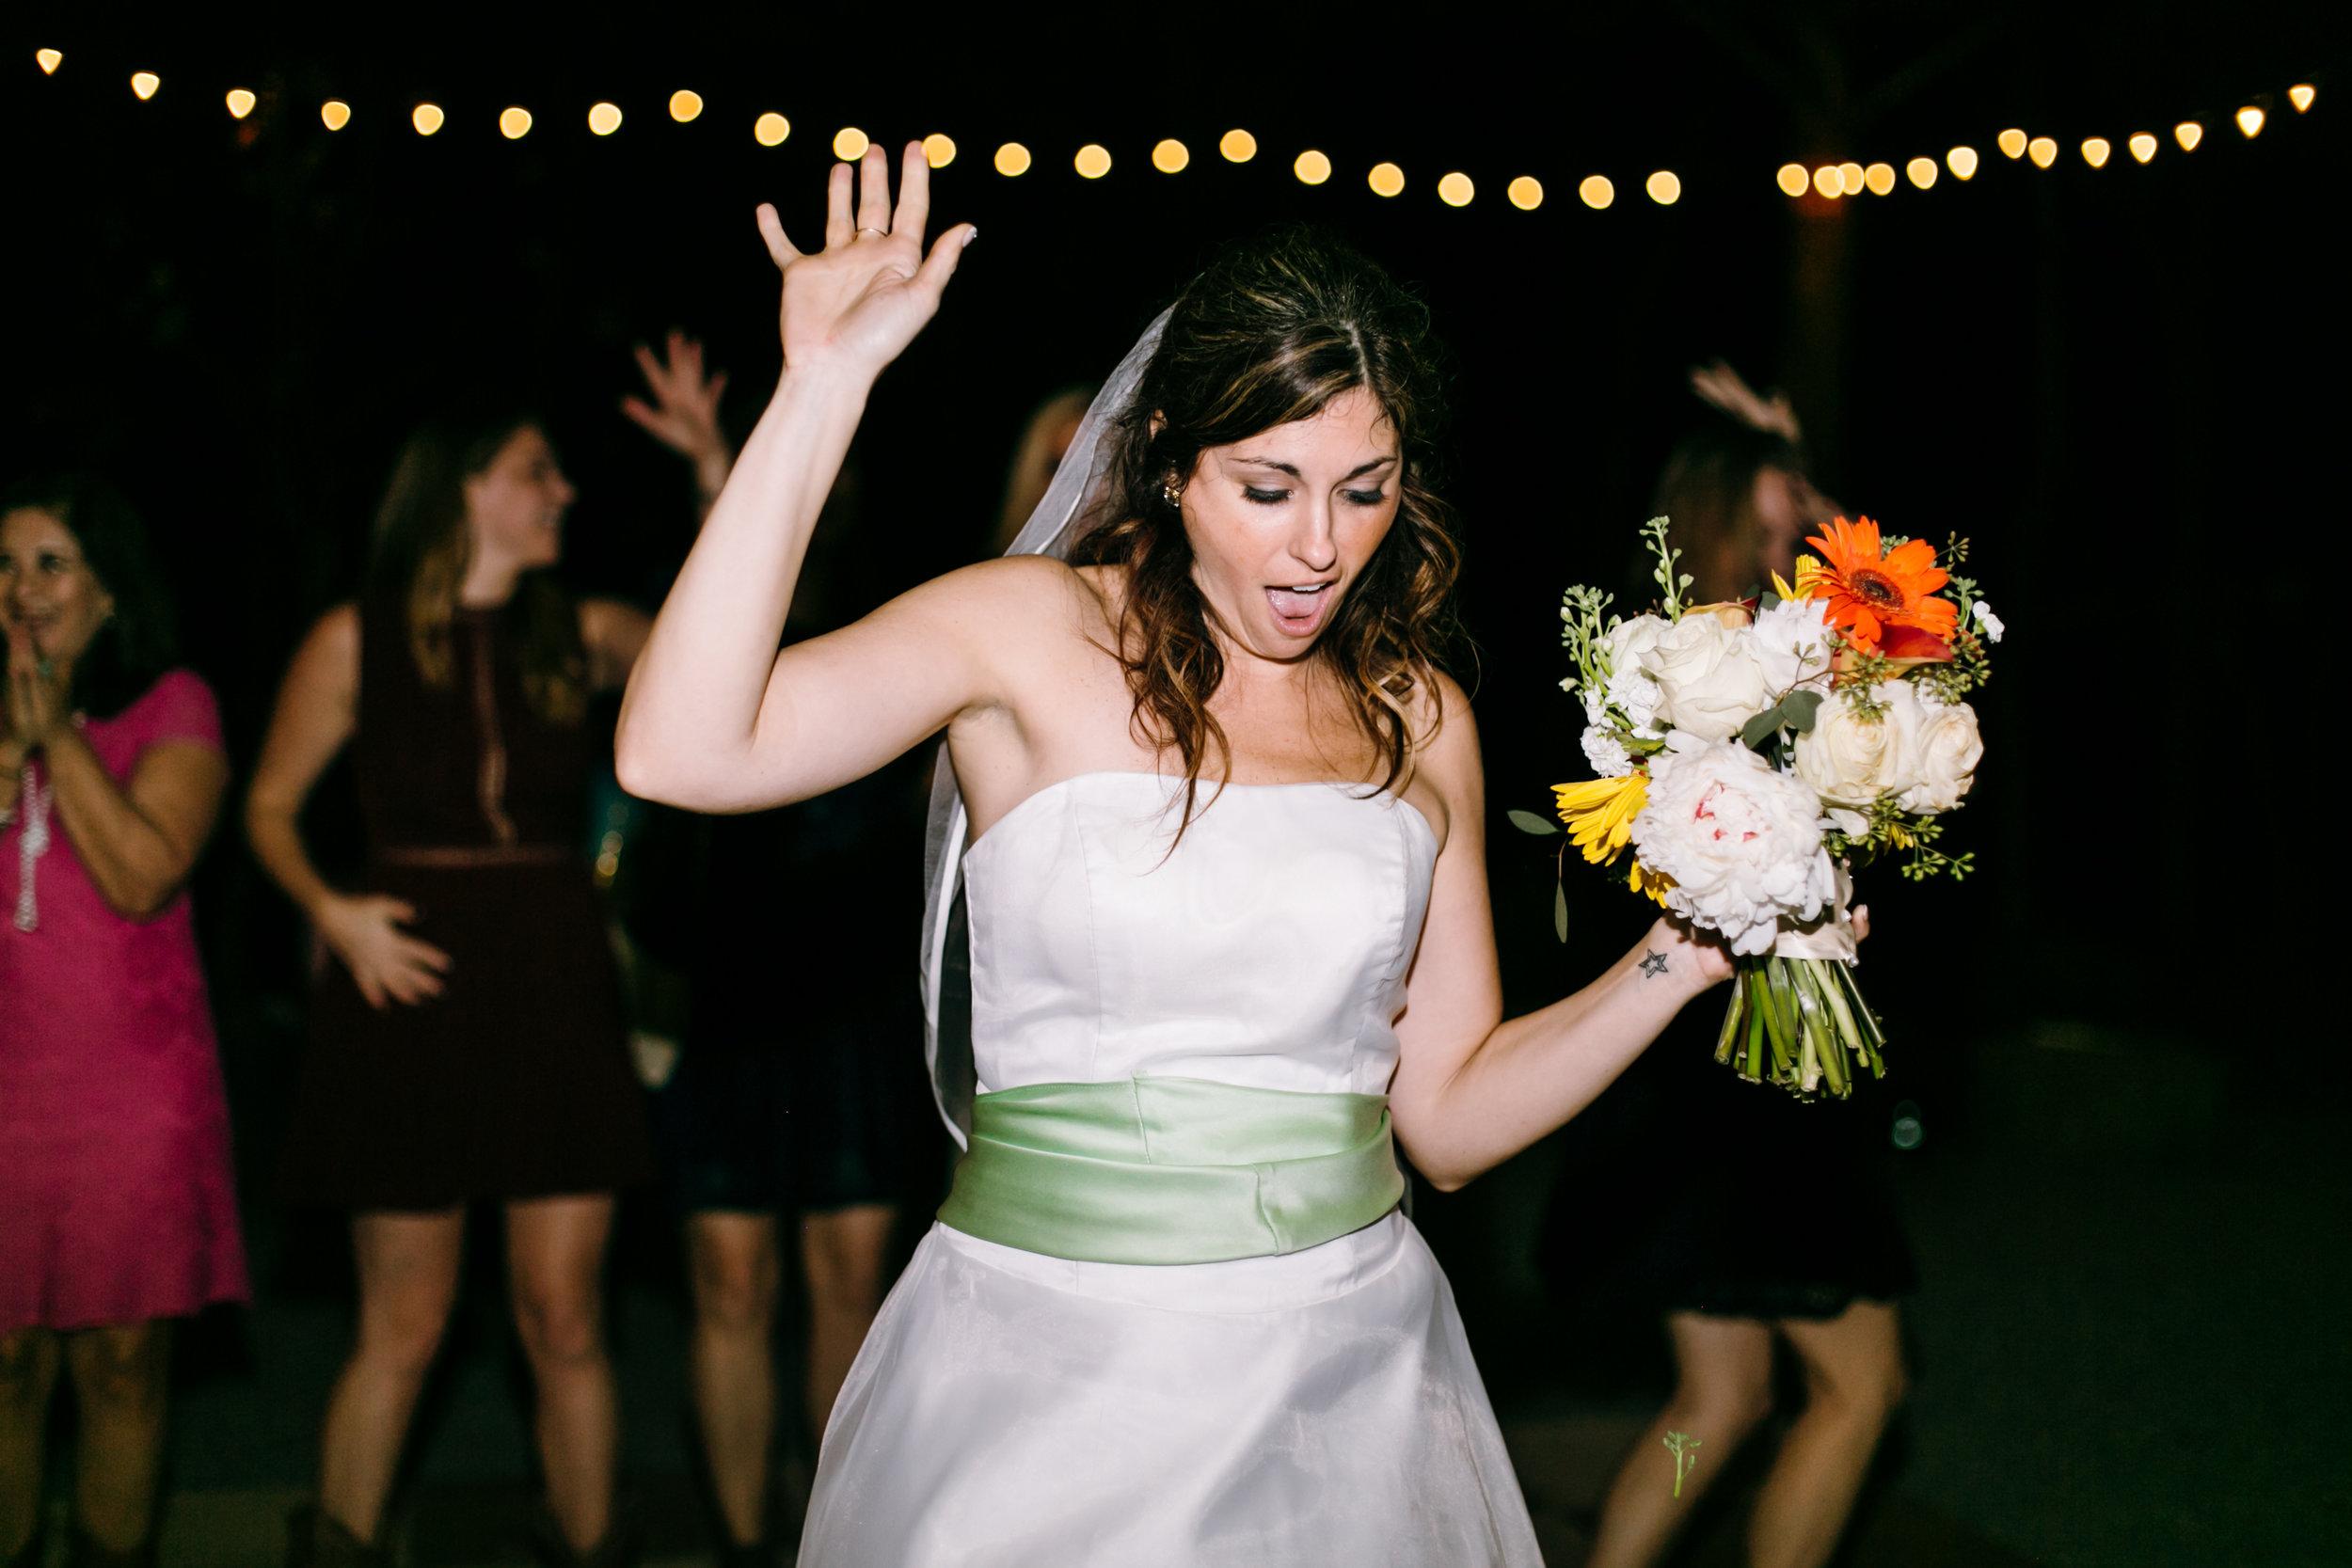 KaraNixonWeddings-Nashville-TN-Wedding-147.jpg